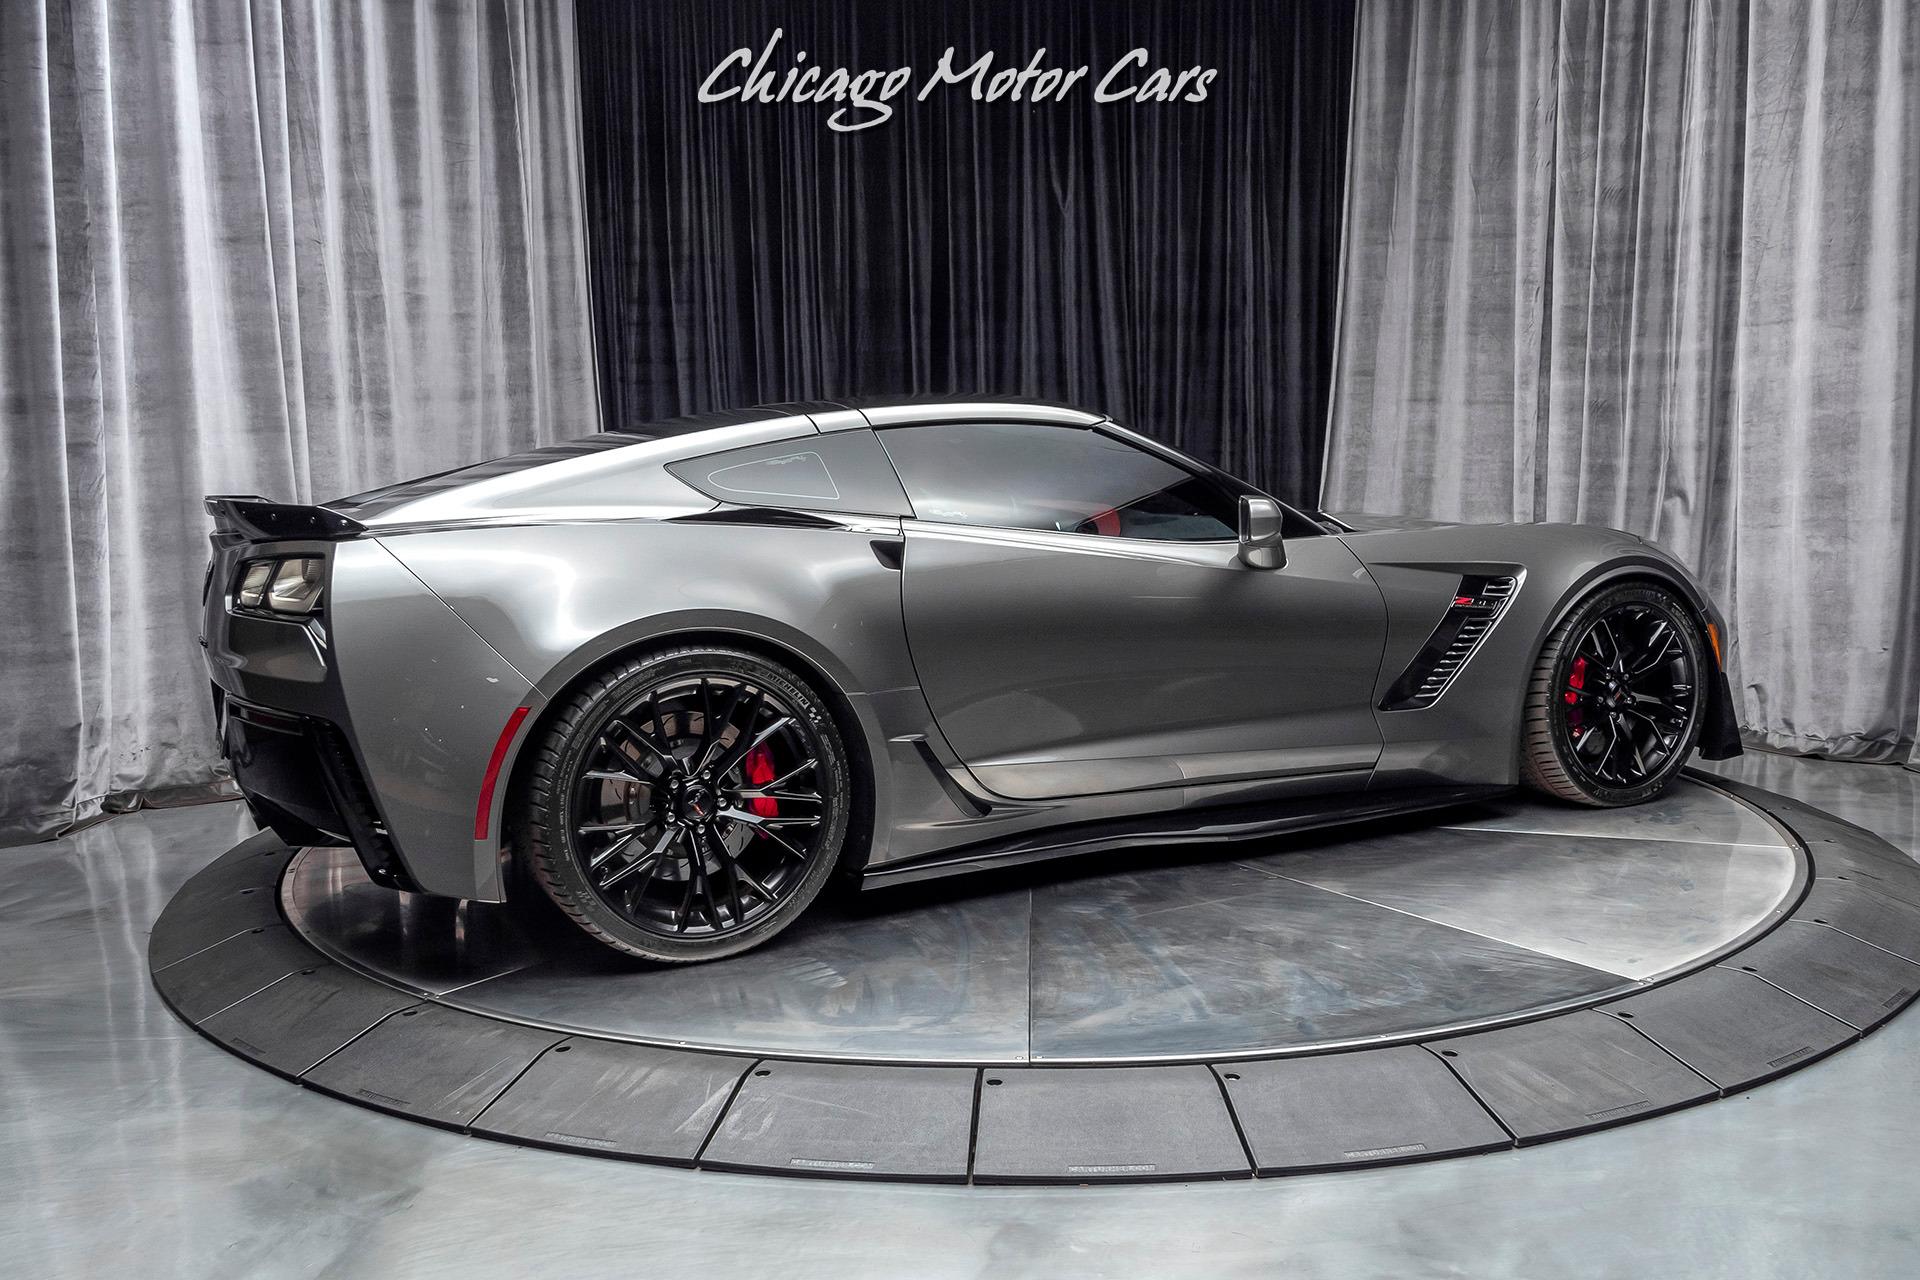 Used 2015 Chevrolet Corvette Z06 2LZ *Built Motor* Upgrades